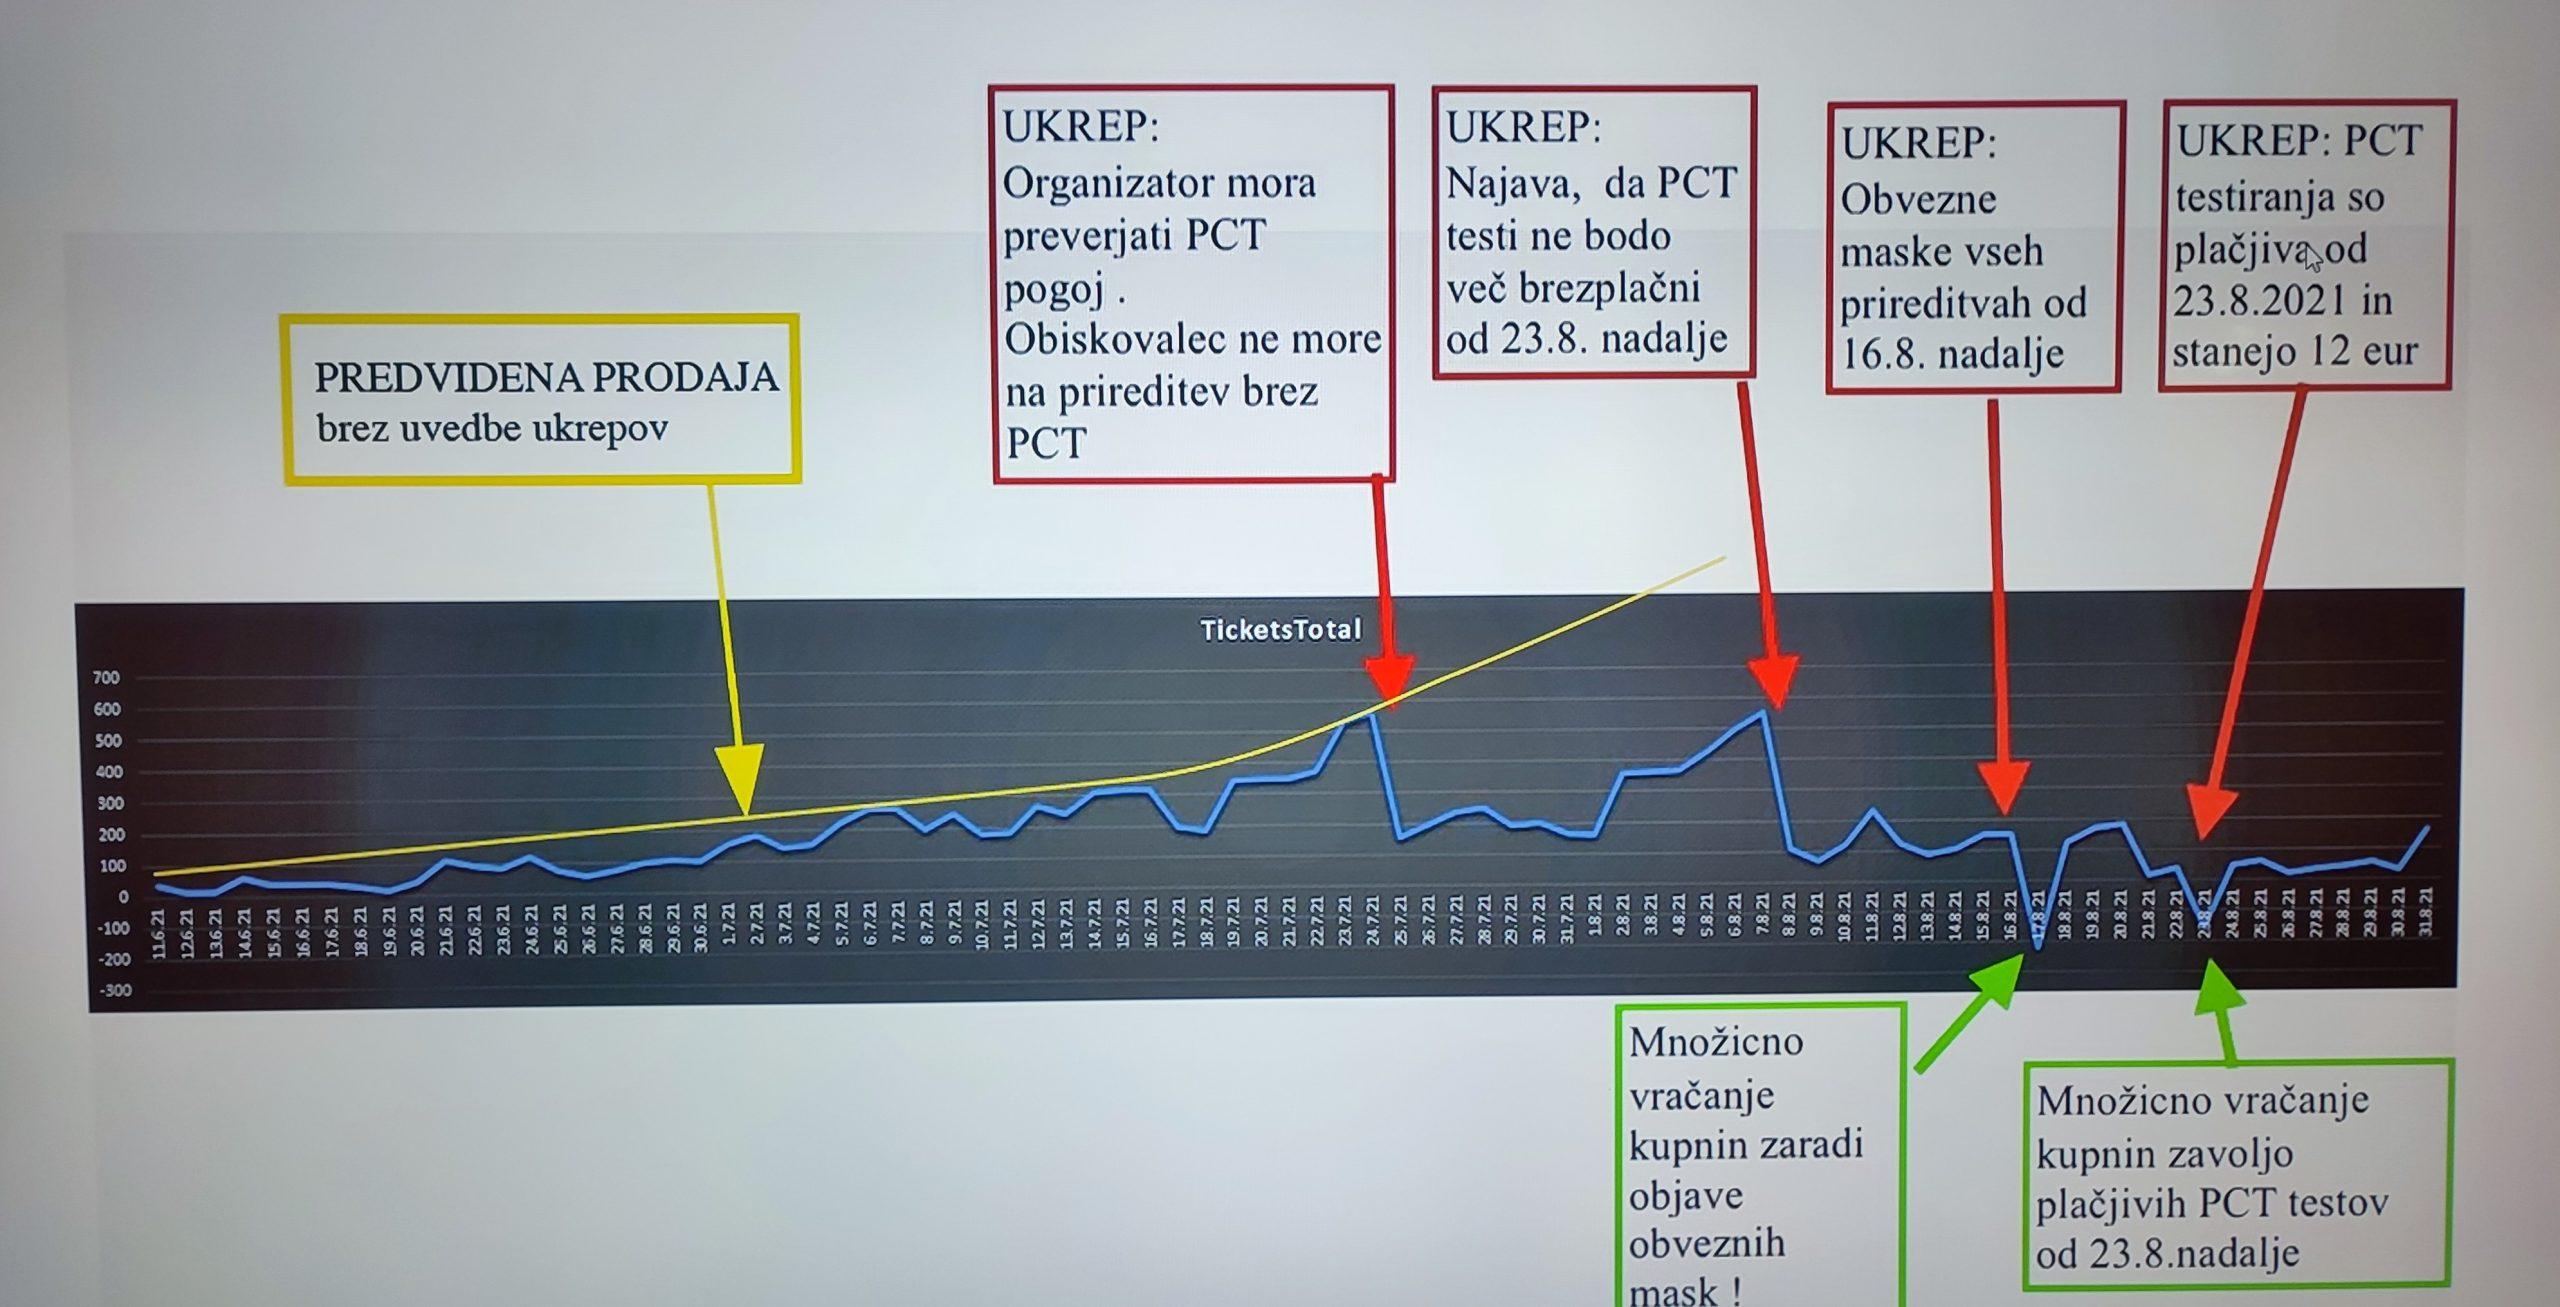 graf, organizatorji dogodkov